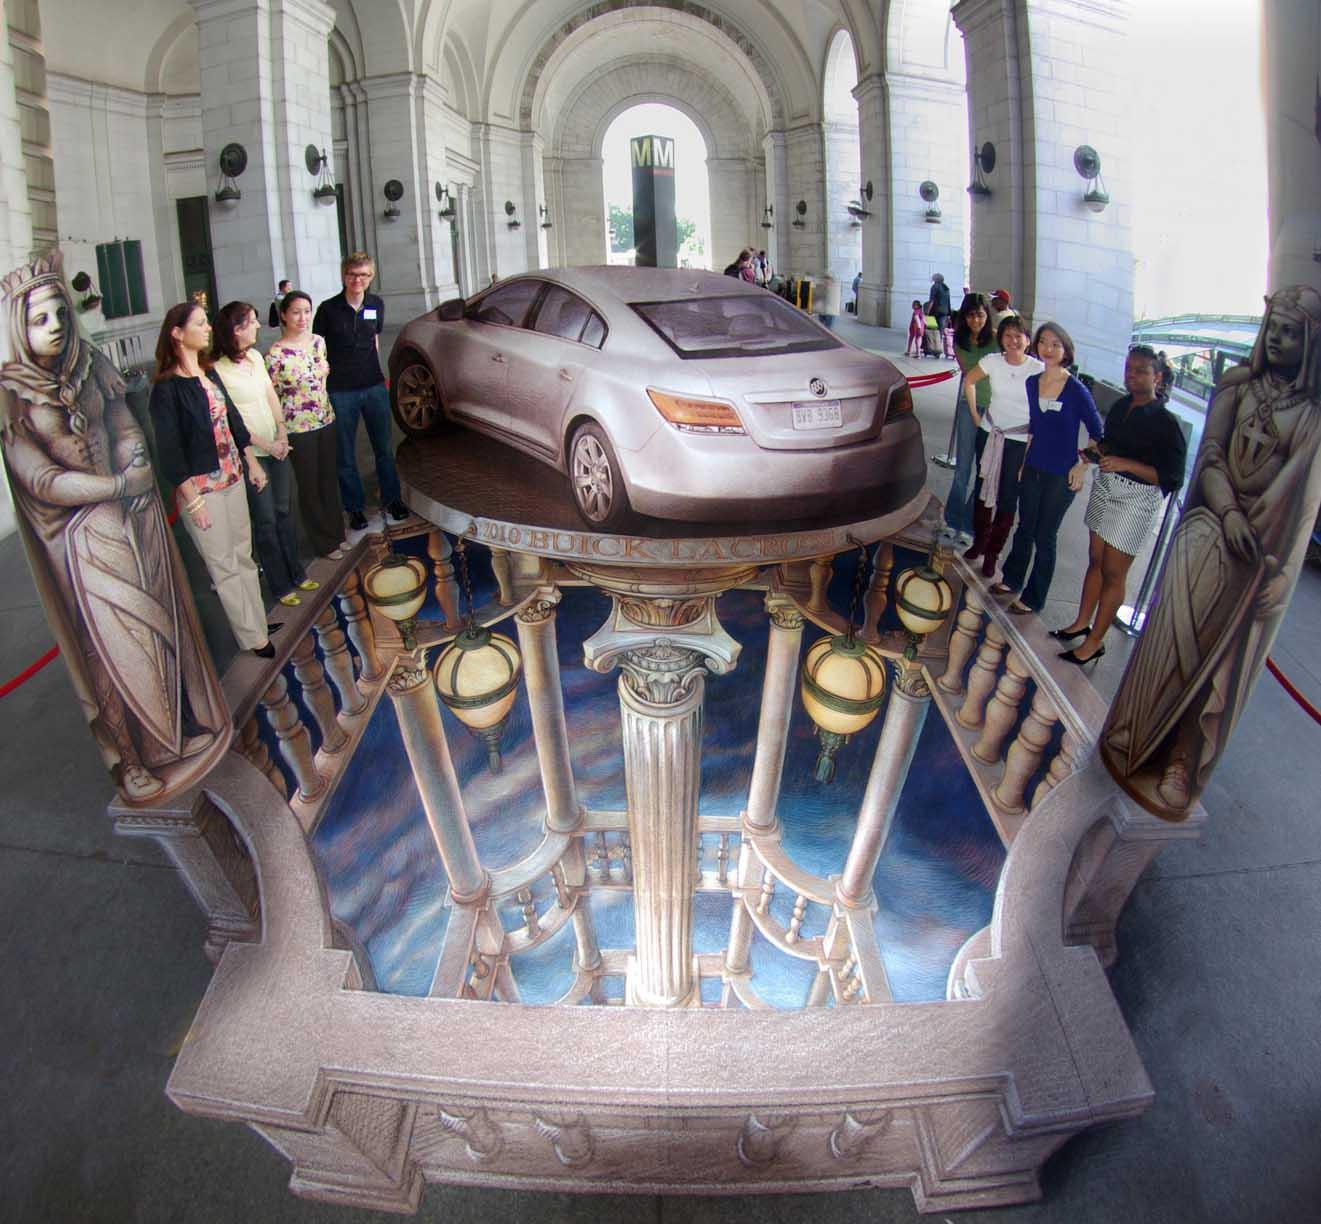 BuickWashingtonD.C.Eventsm 45 Stunning 3D Paintings for Decoration